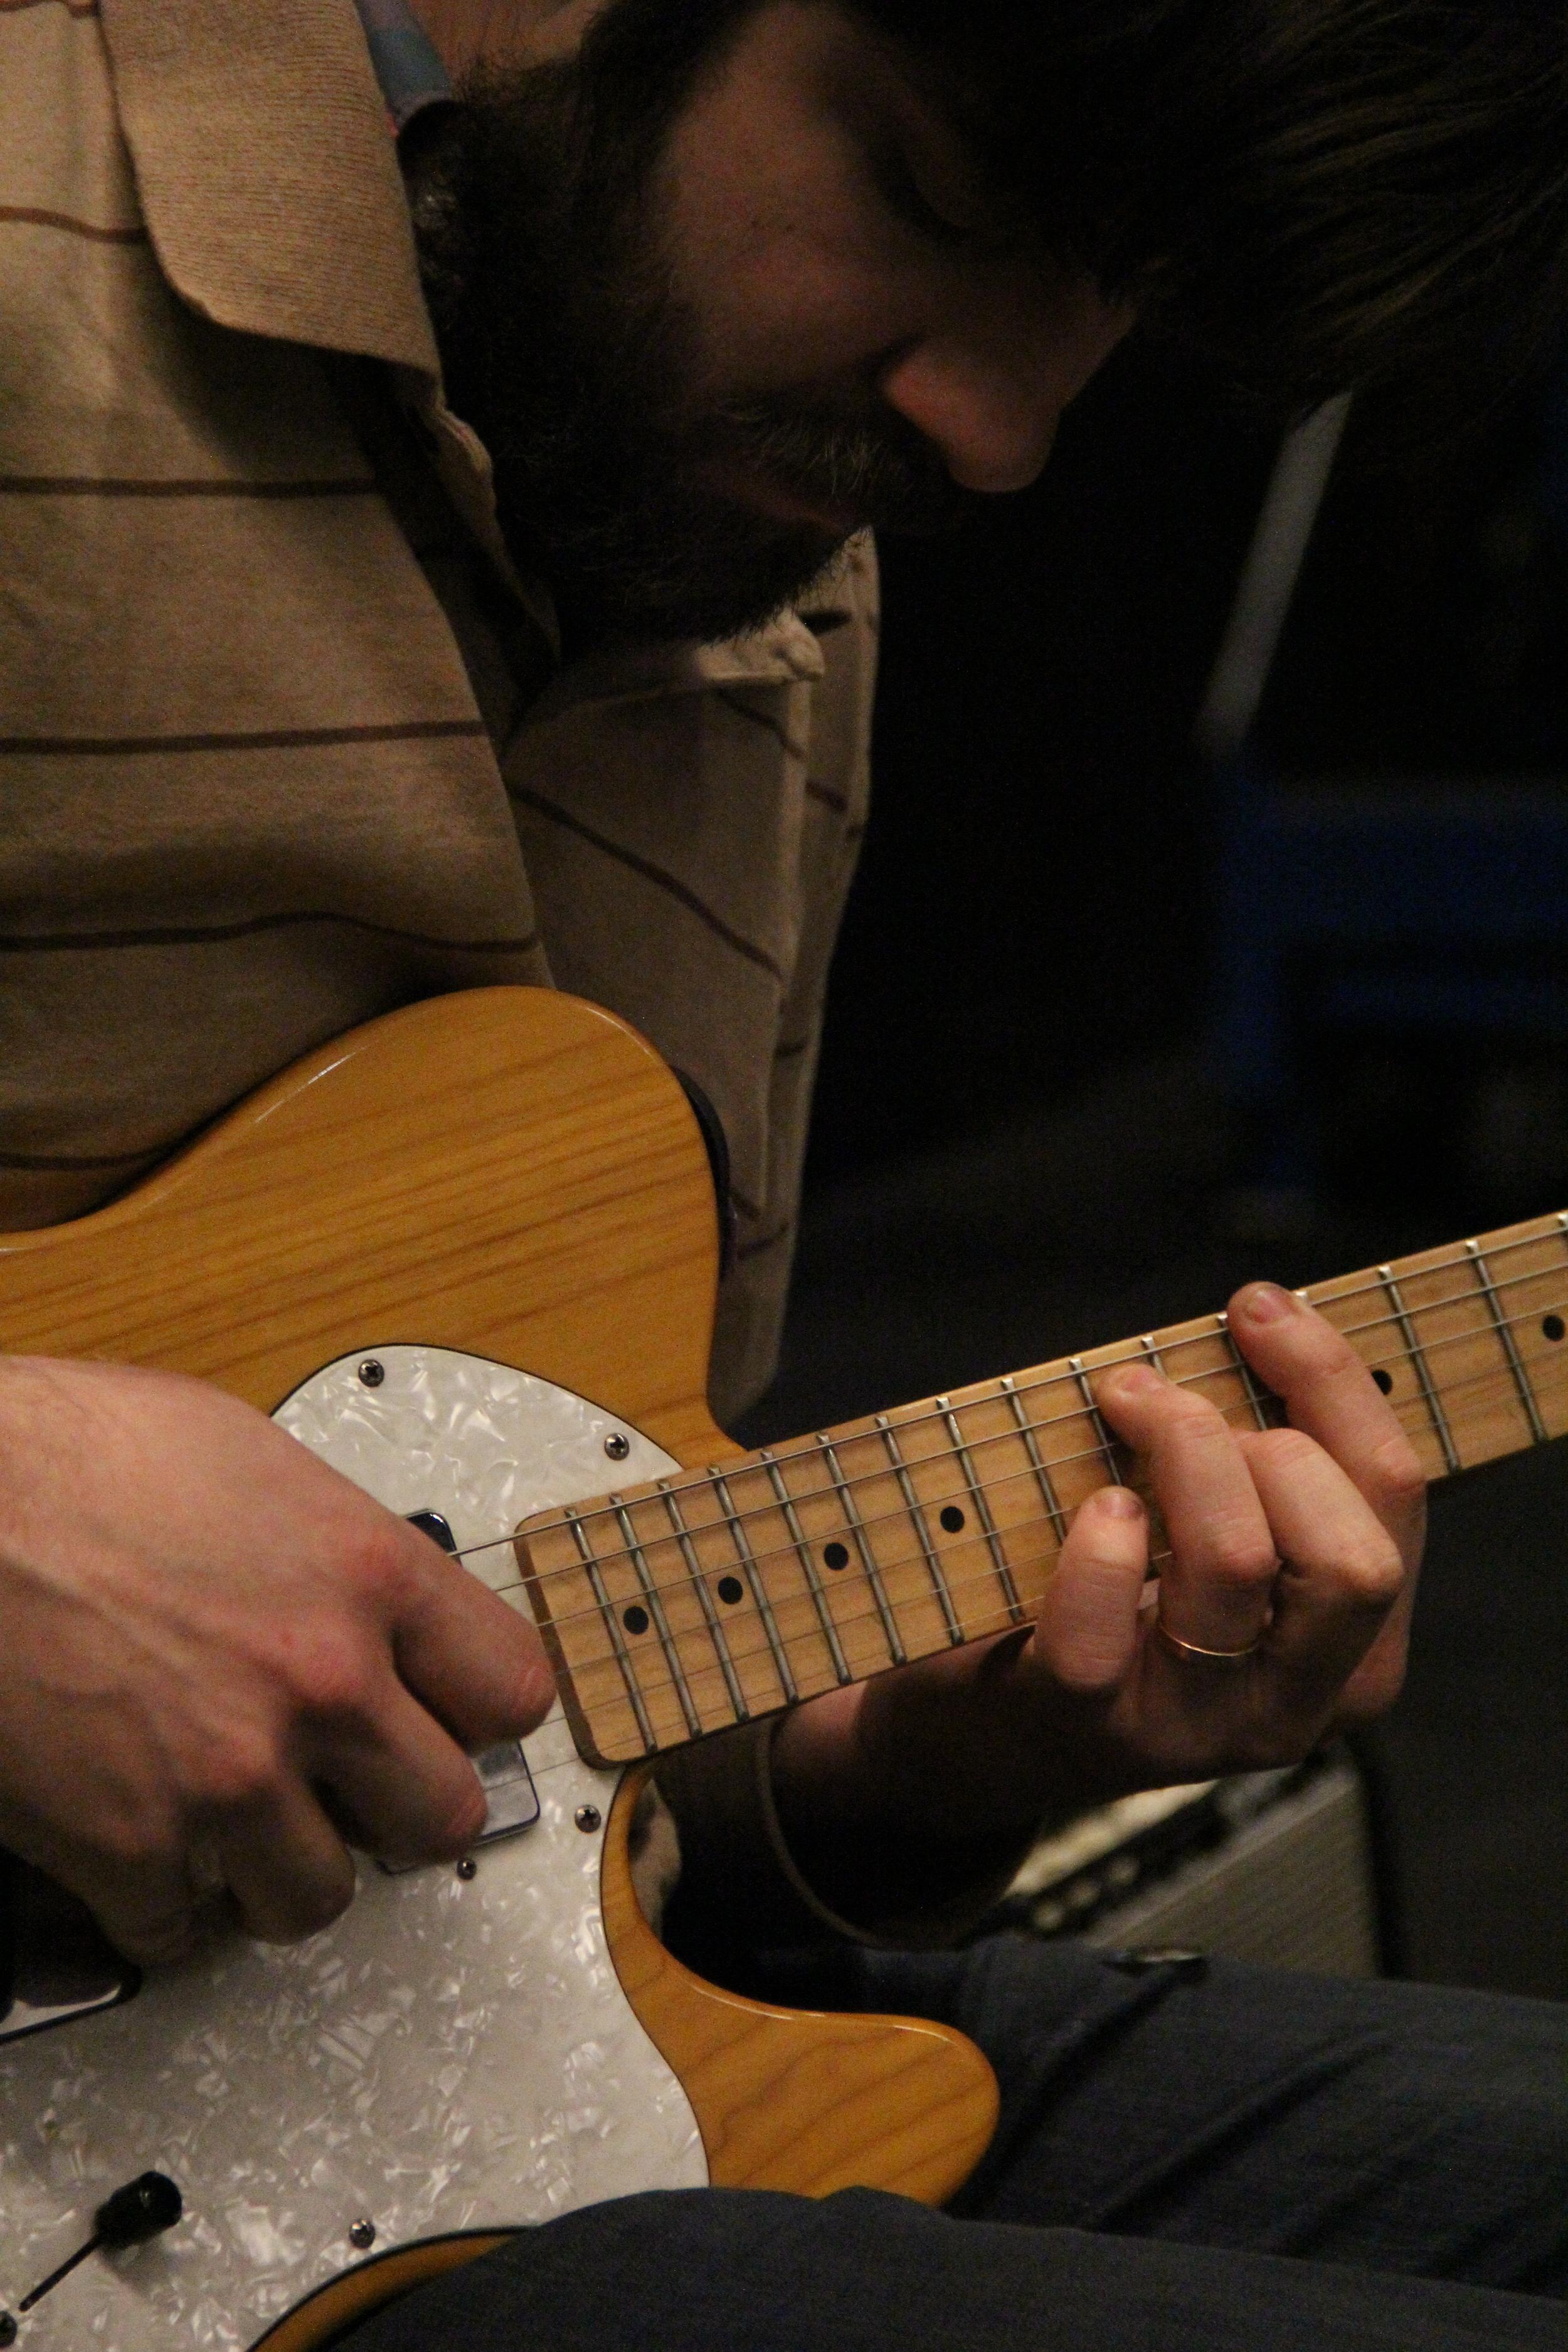 Musician Sam McCormally plays guitar during Meena's Dream. Photo by Q. Terah Jackson.